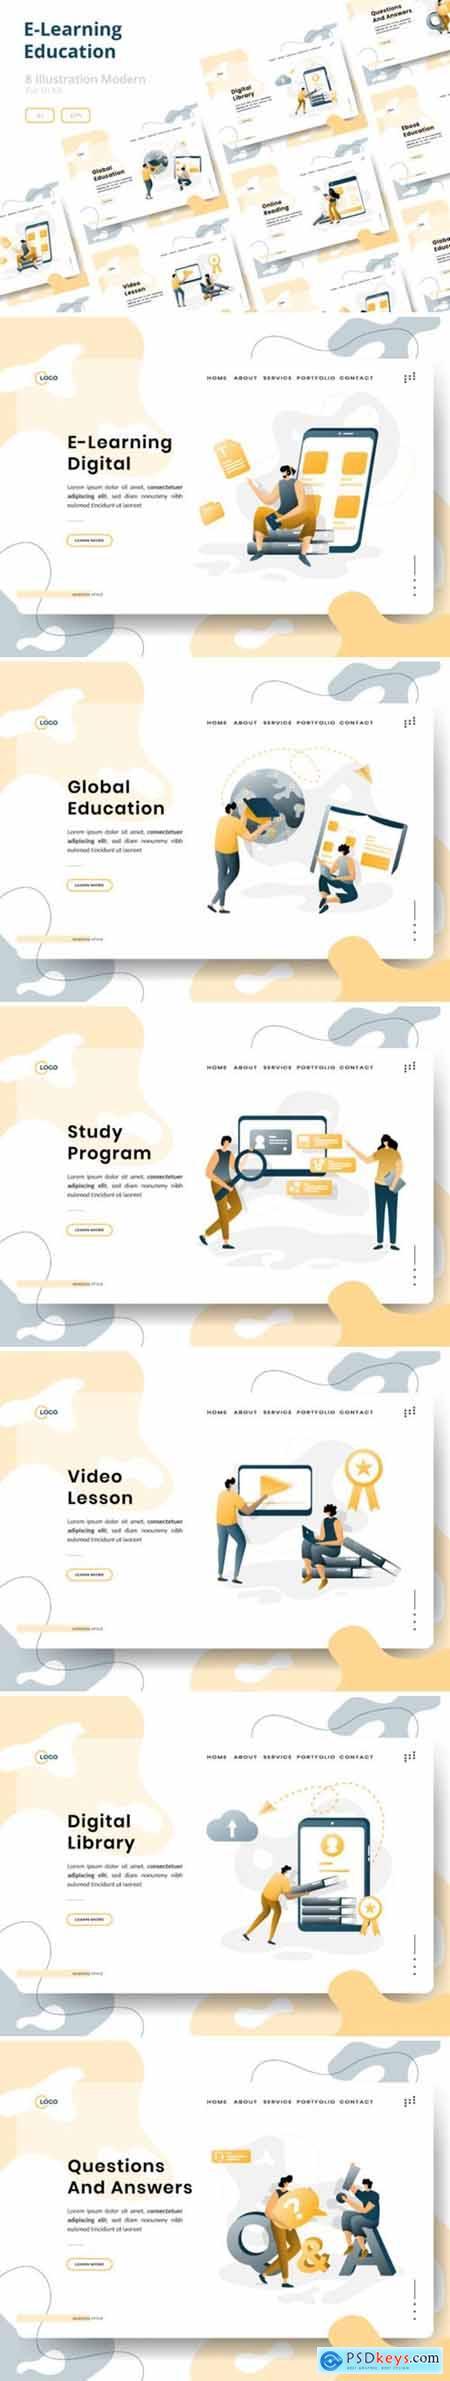 E-Learning Education 3623989